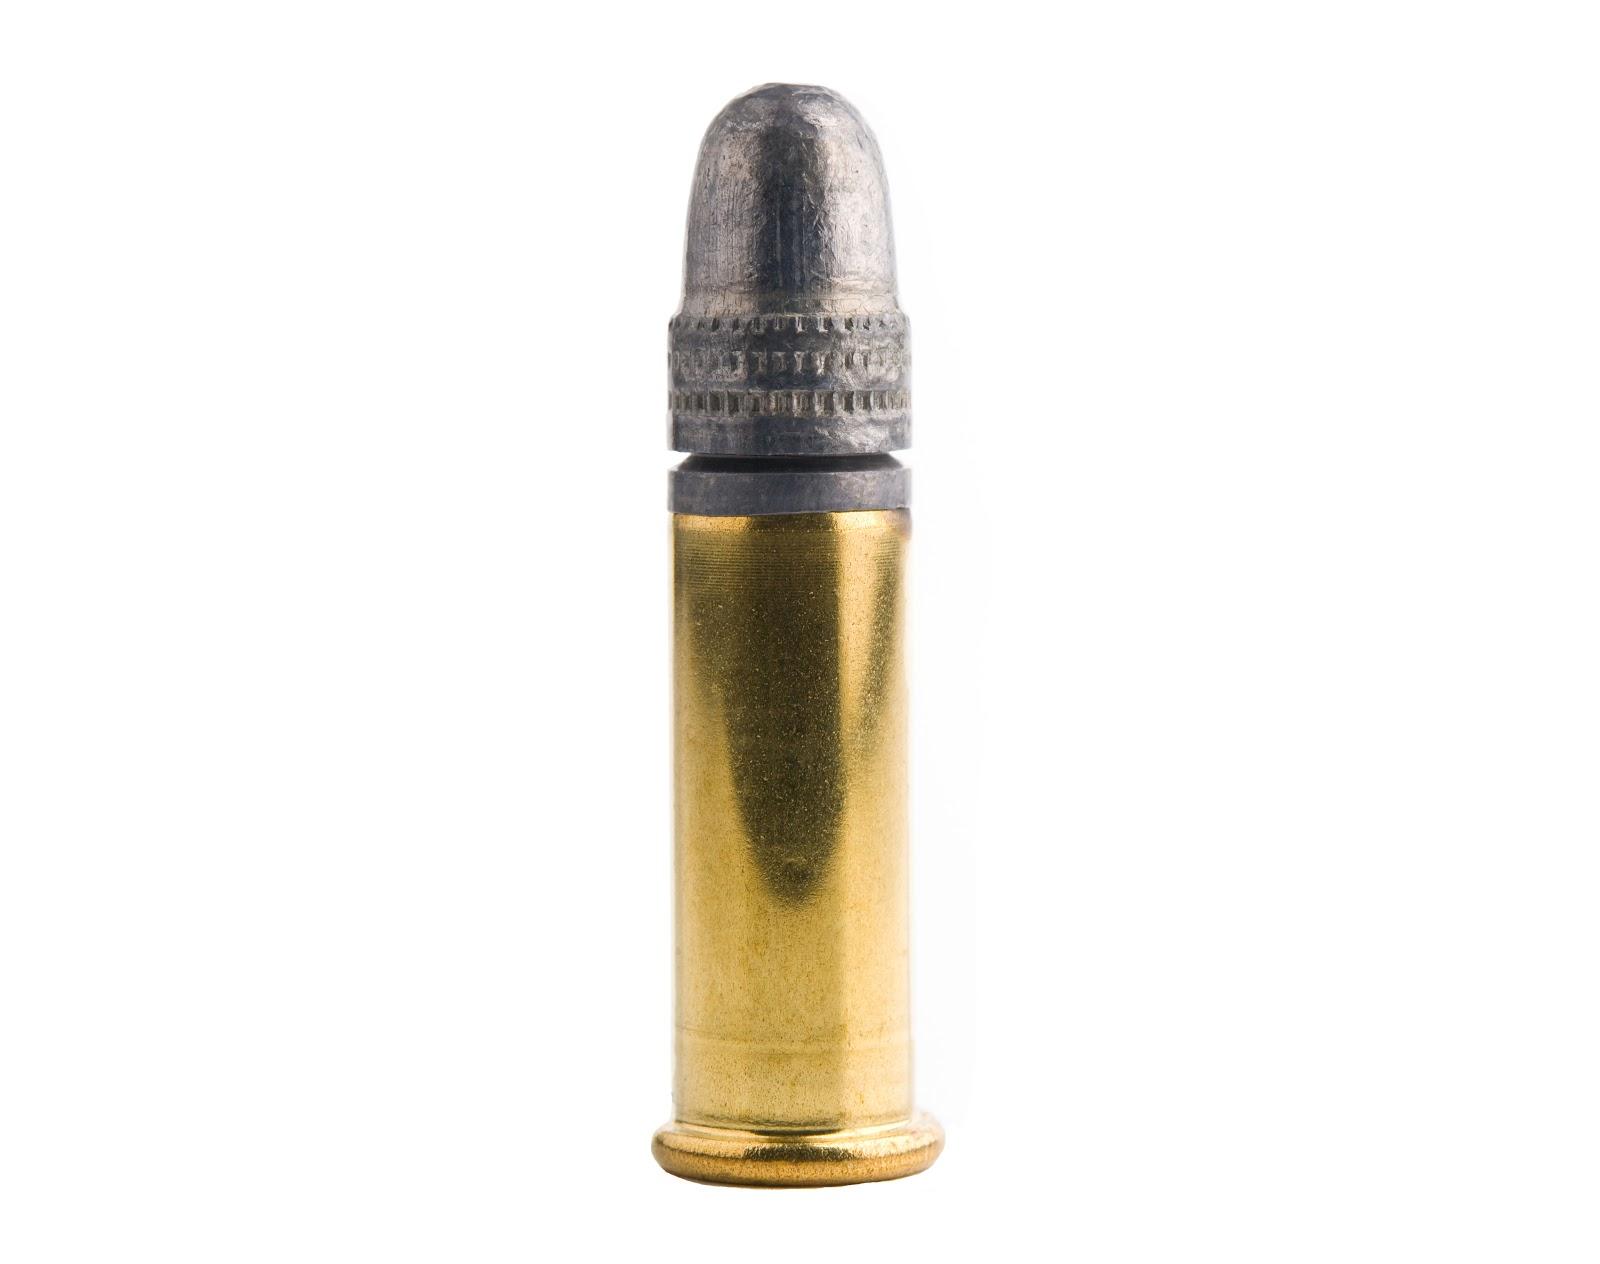 rimfire ammo